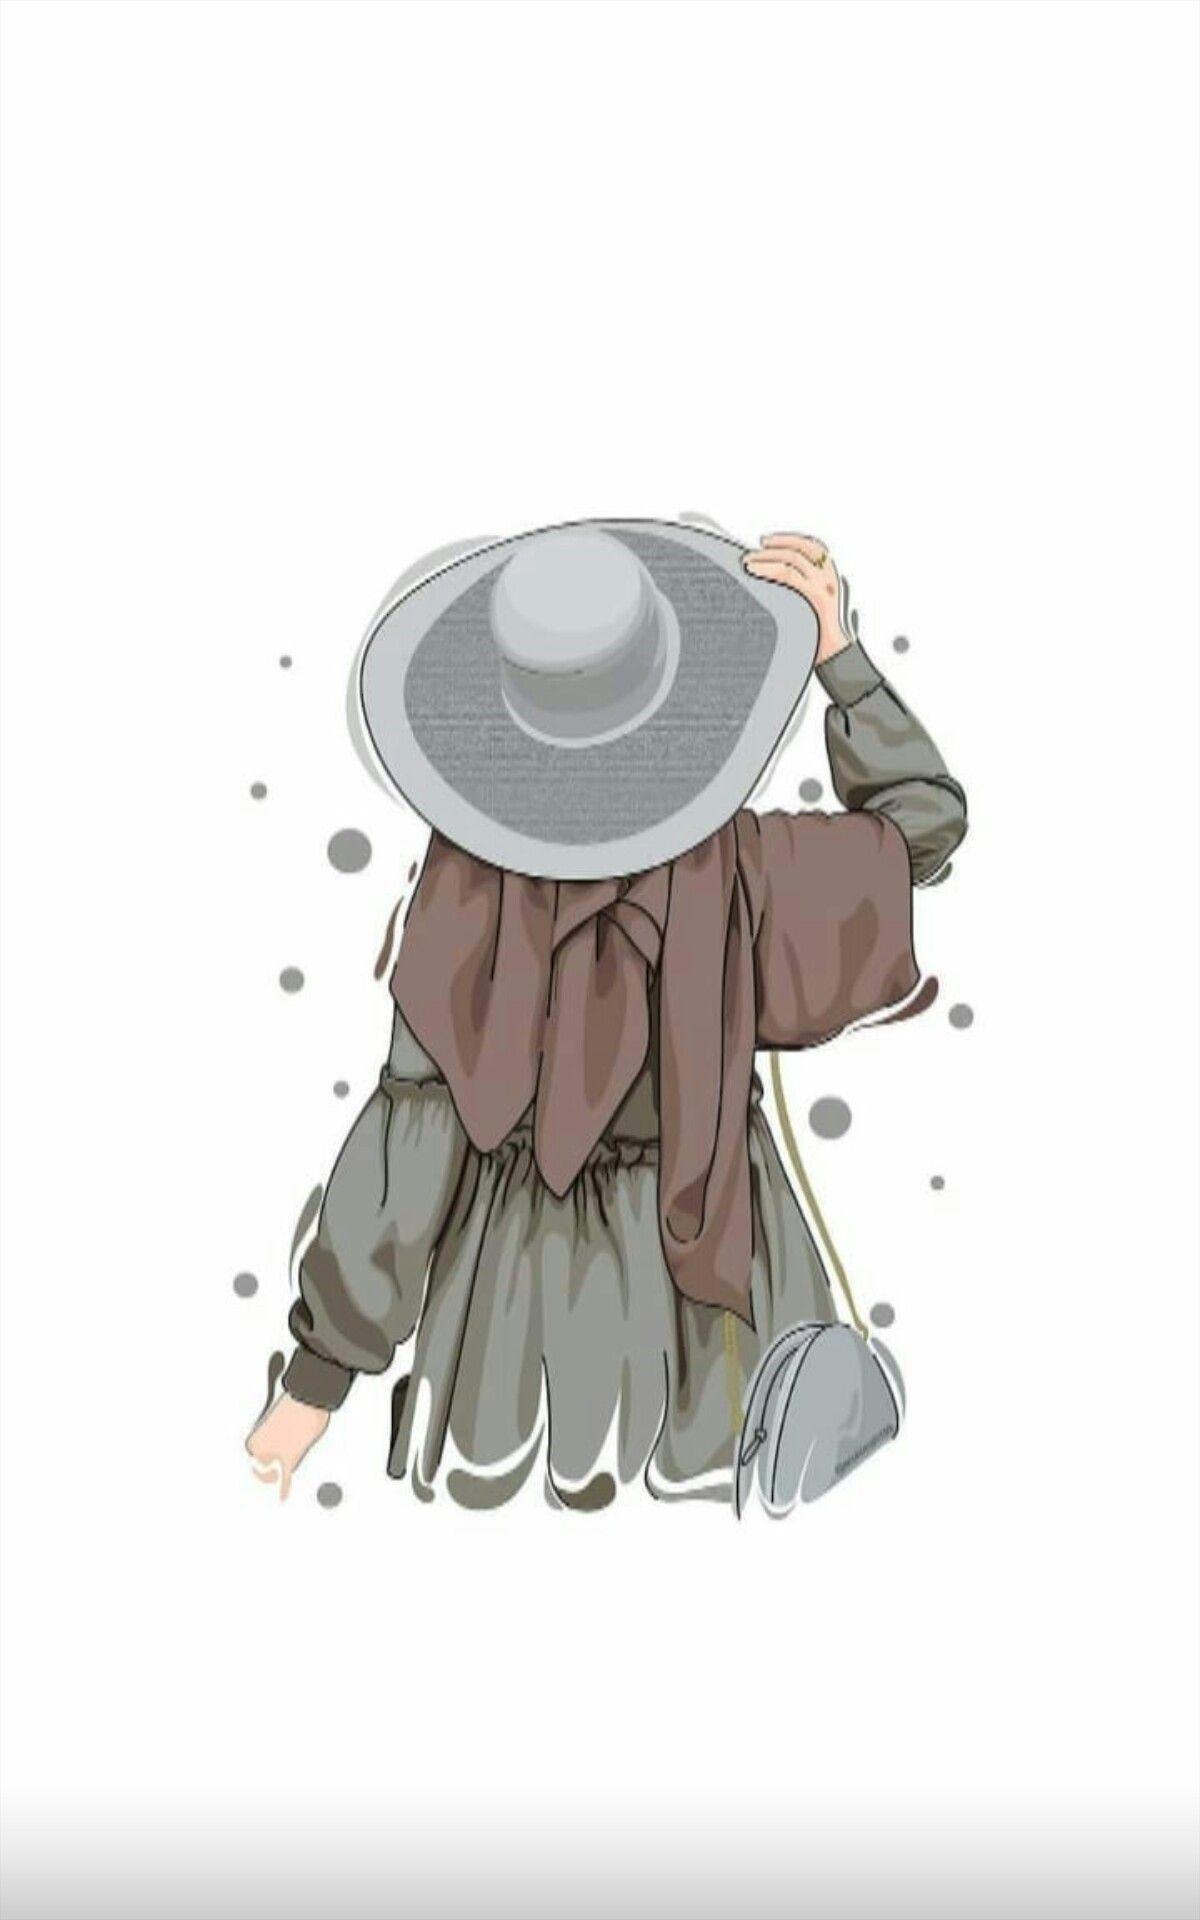 Profil wa gambar kartun hijab keren. Anime Hijab Wallpapers Top Free Anime Hijab Backgrounds Wallpaperaccess